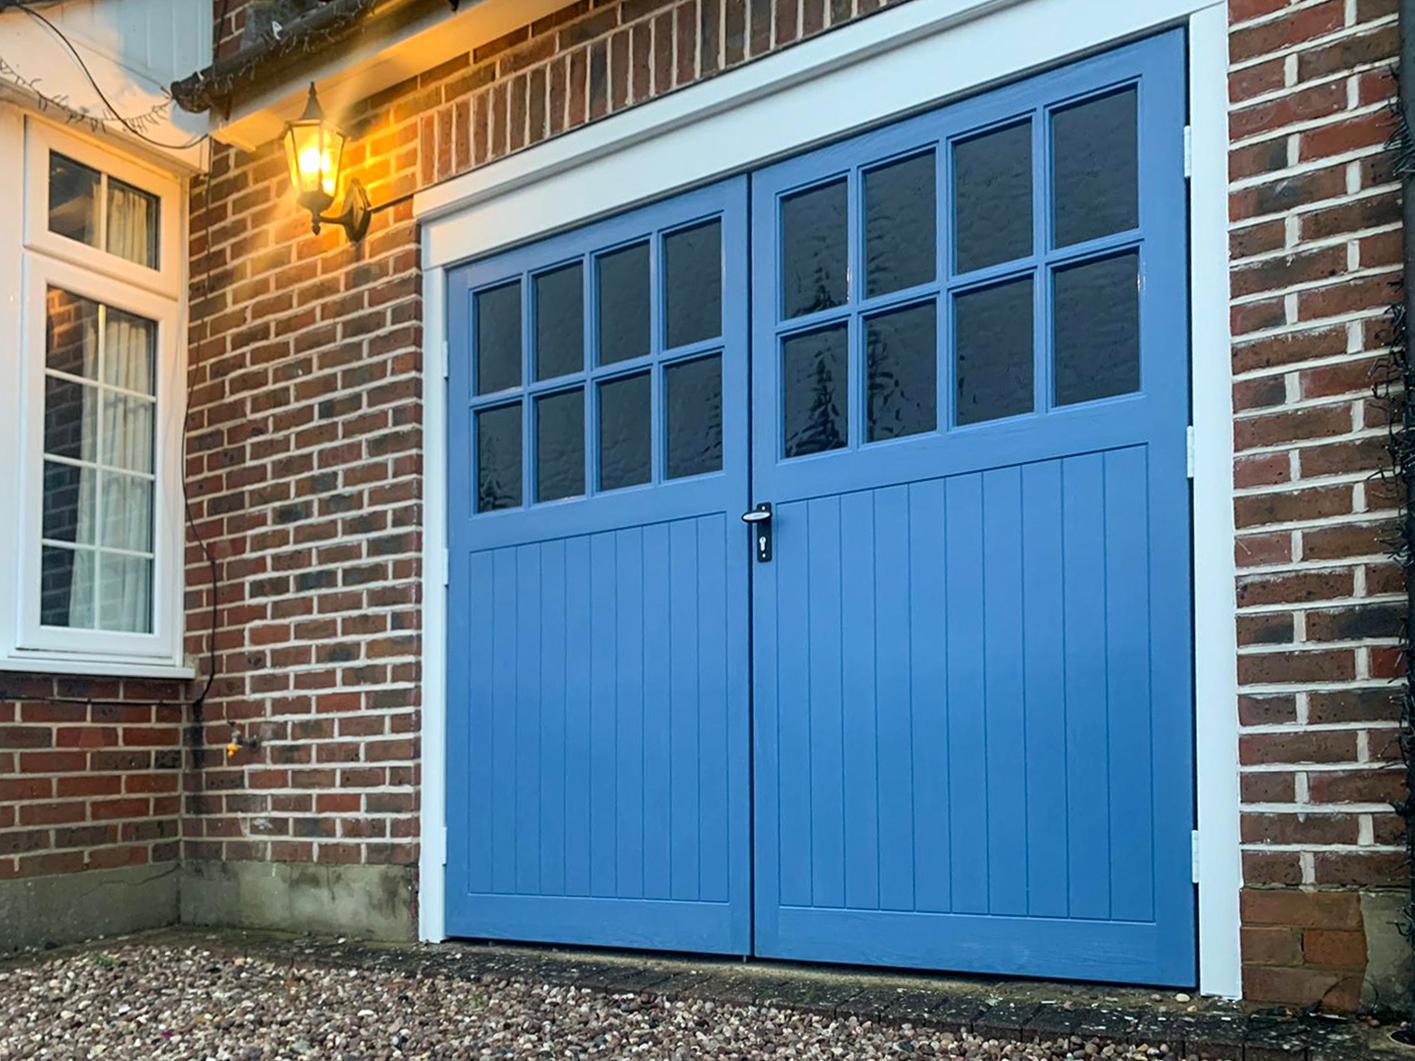 Wessex Sherwood Wood Grain GRP Side Hinged Garage Doors Finished in Wedgewood